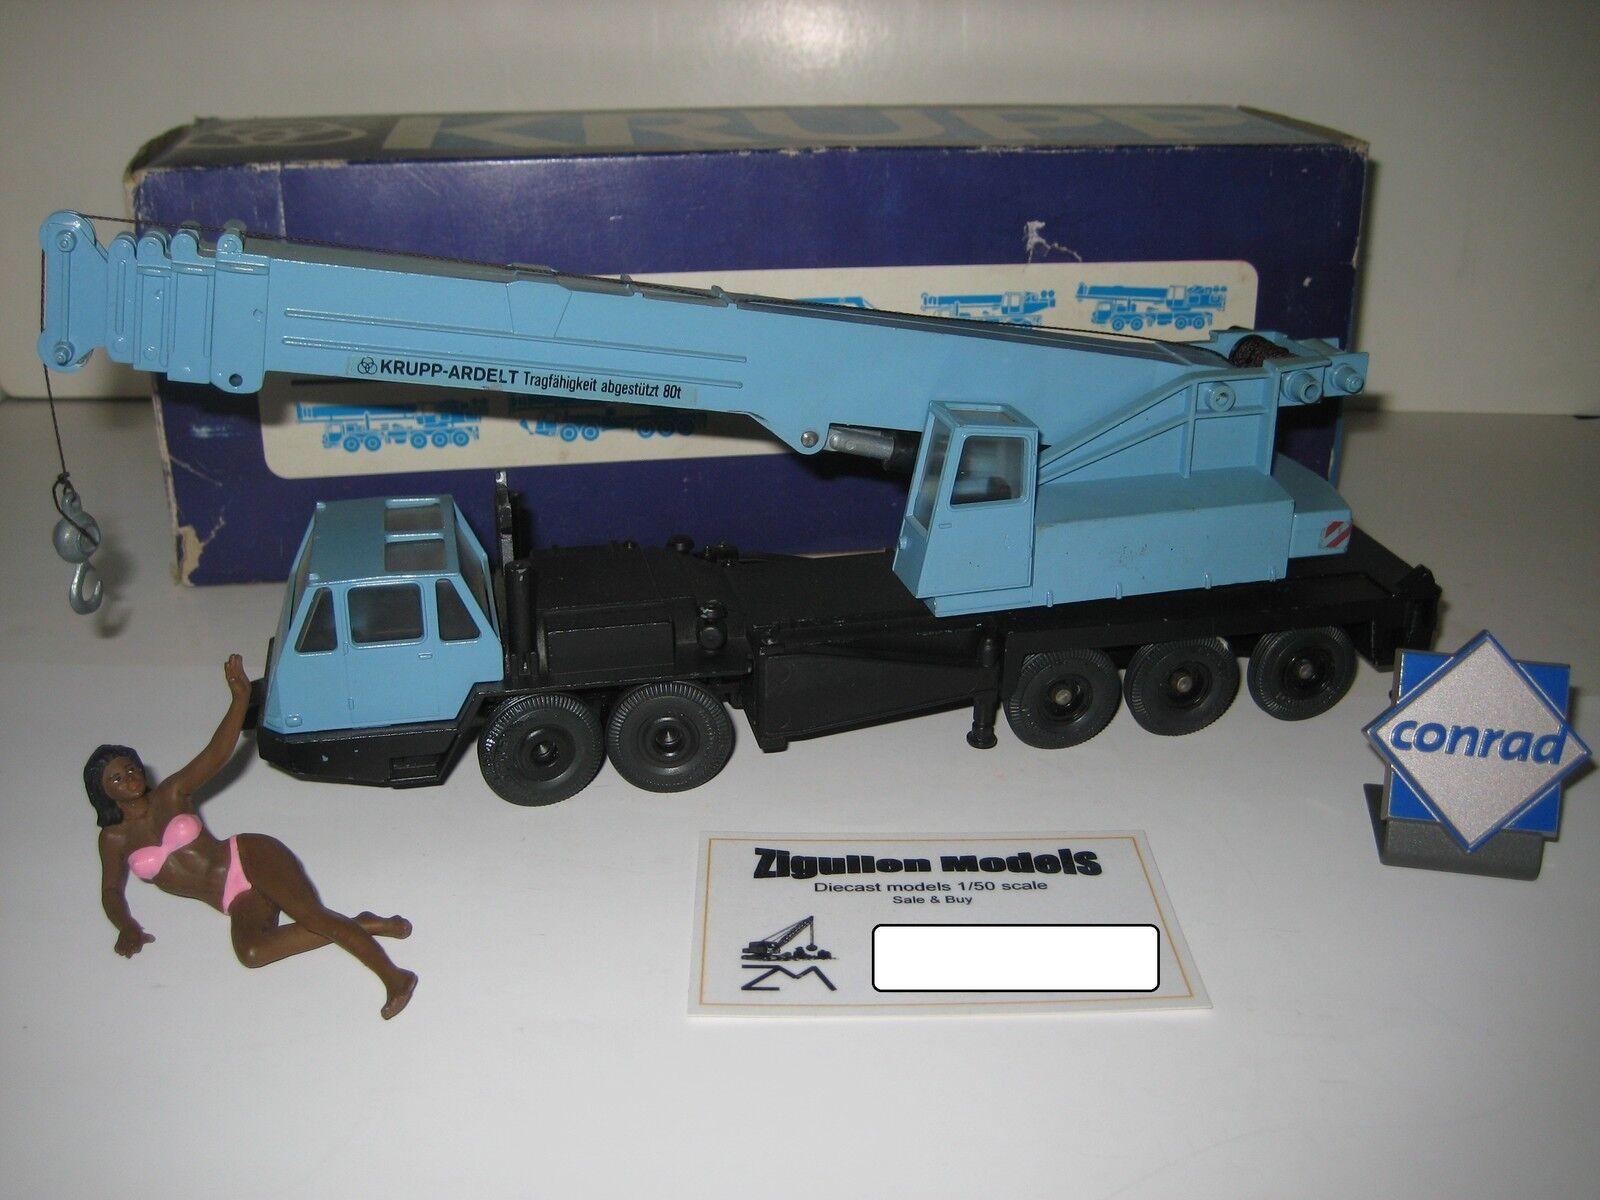 Krupp Ardelt GMT 80 gru auto blu #3070.2 Conrad 1:50 OVP